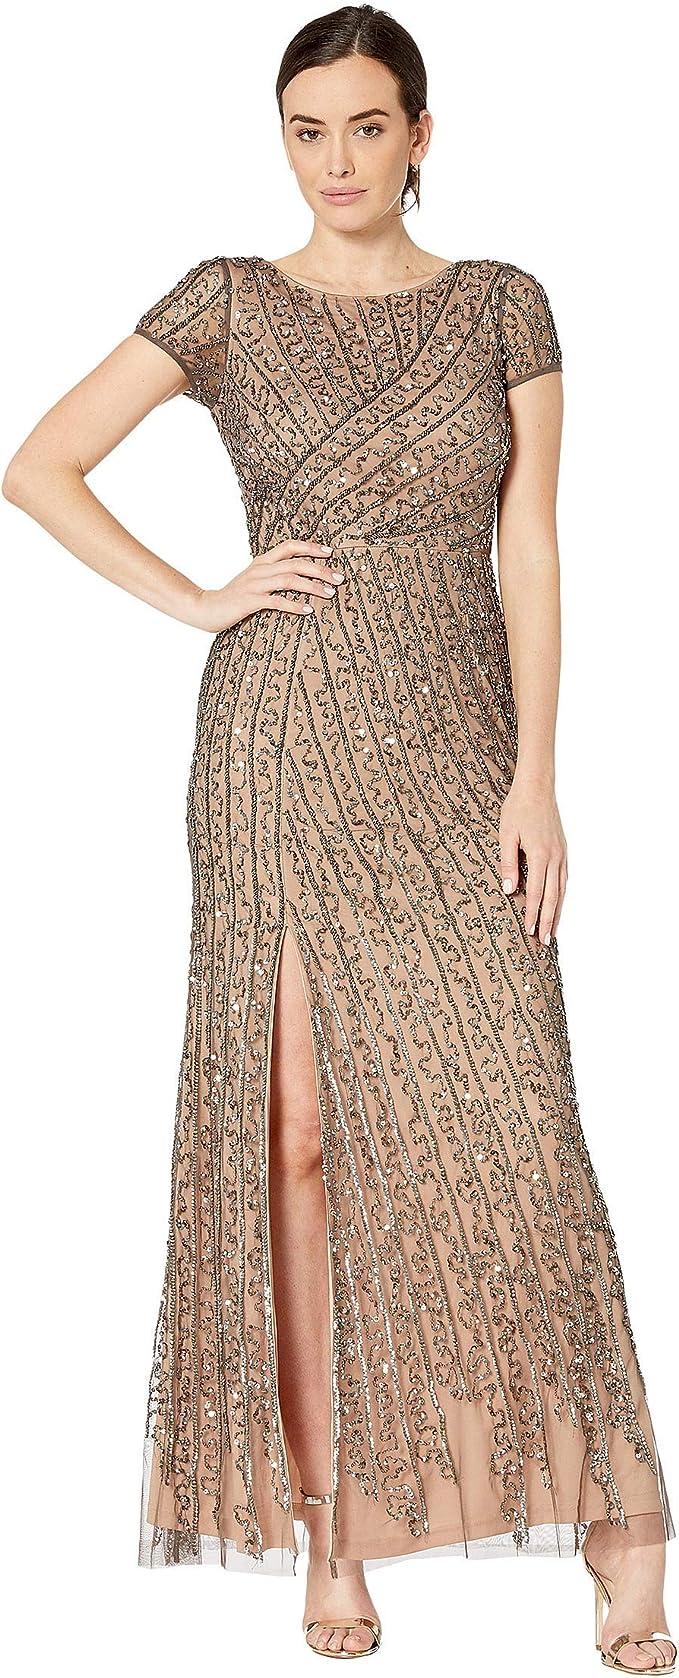 Beaded Dress, Long Sleeve Beaded Dress,beaded dress,